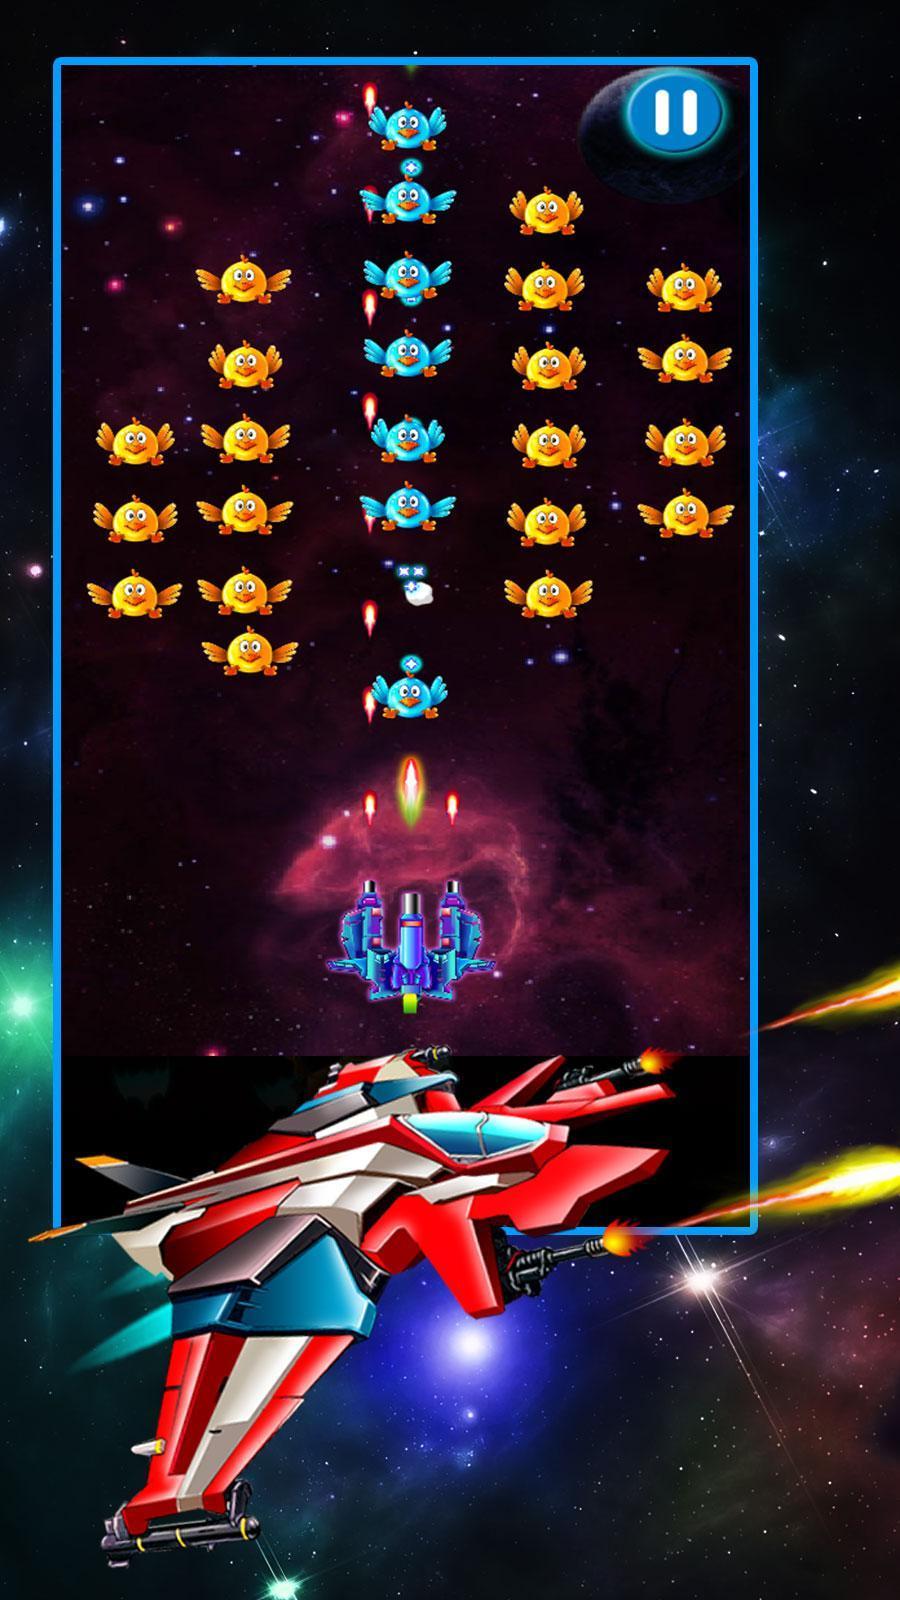 Chicken Shooter Galaxy Attack 2.8 Screenshot 8